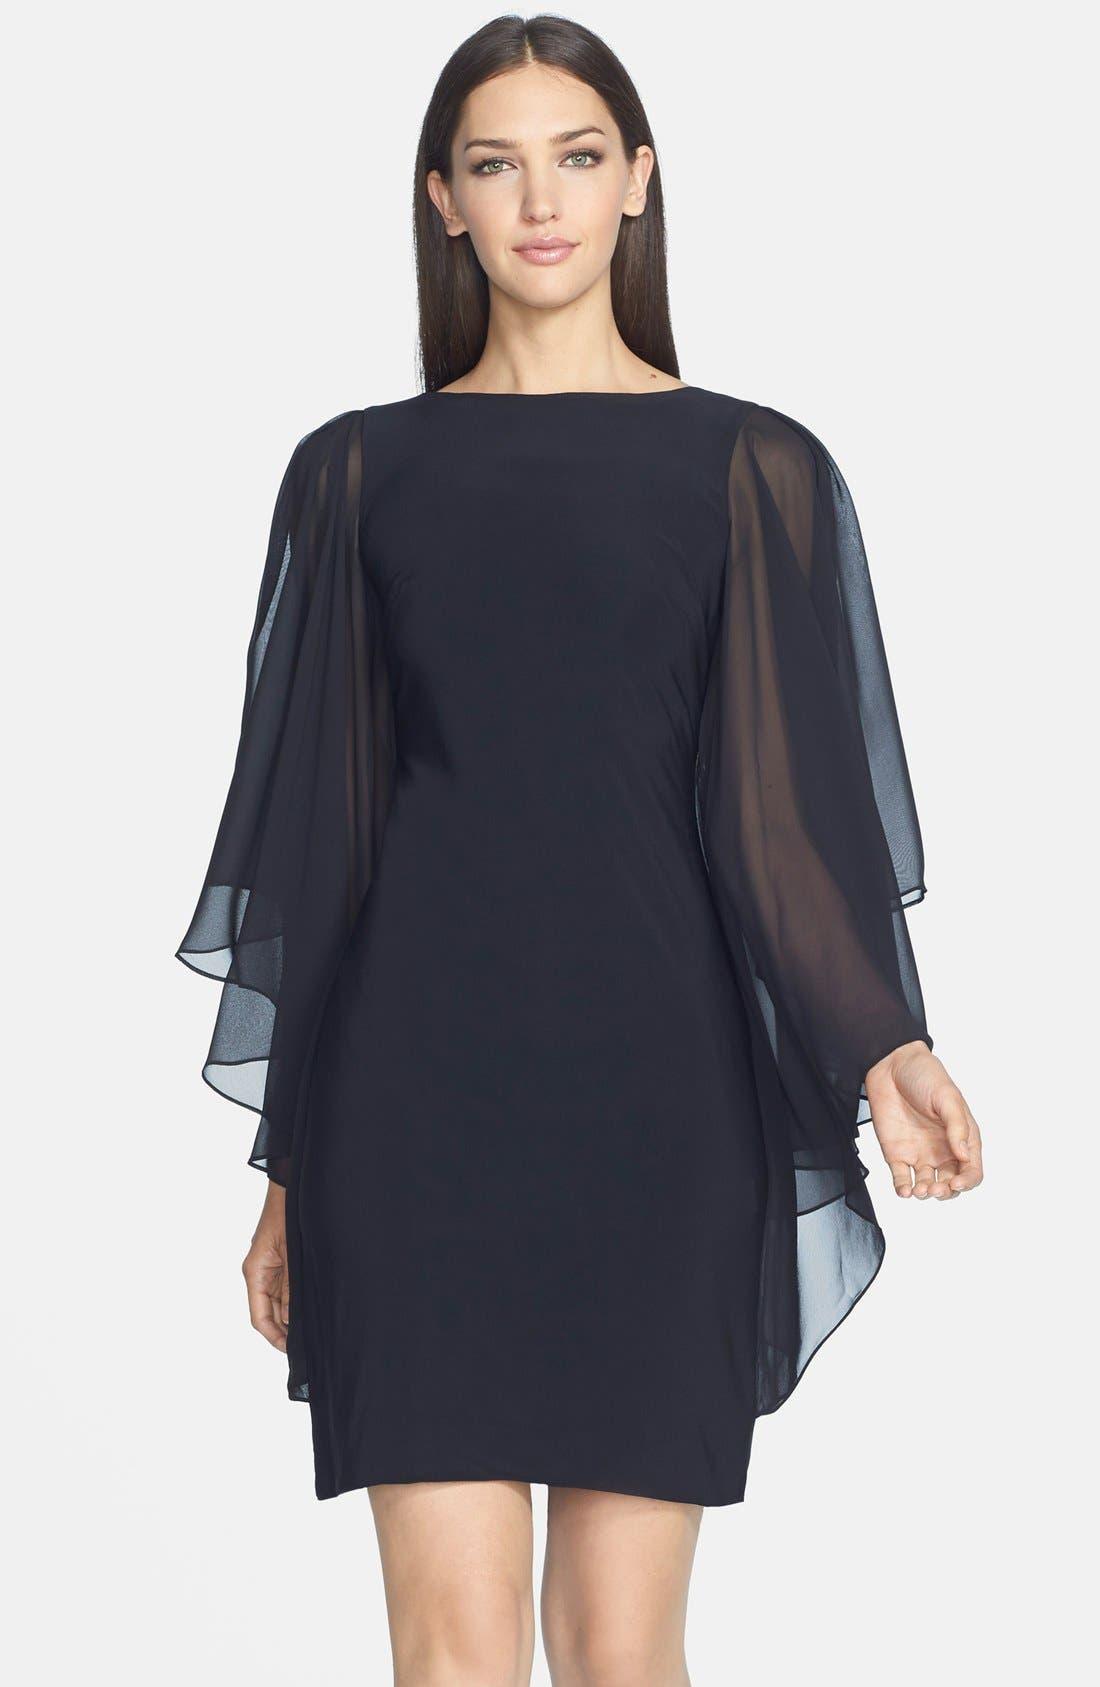 Alternate Image 1 Selected - JS Boutique Chiffon Butterfly Sleeve Jersey Sheath Dress